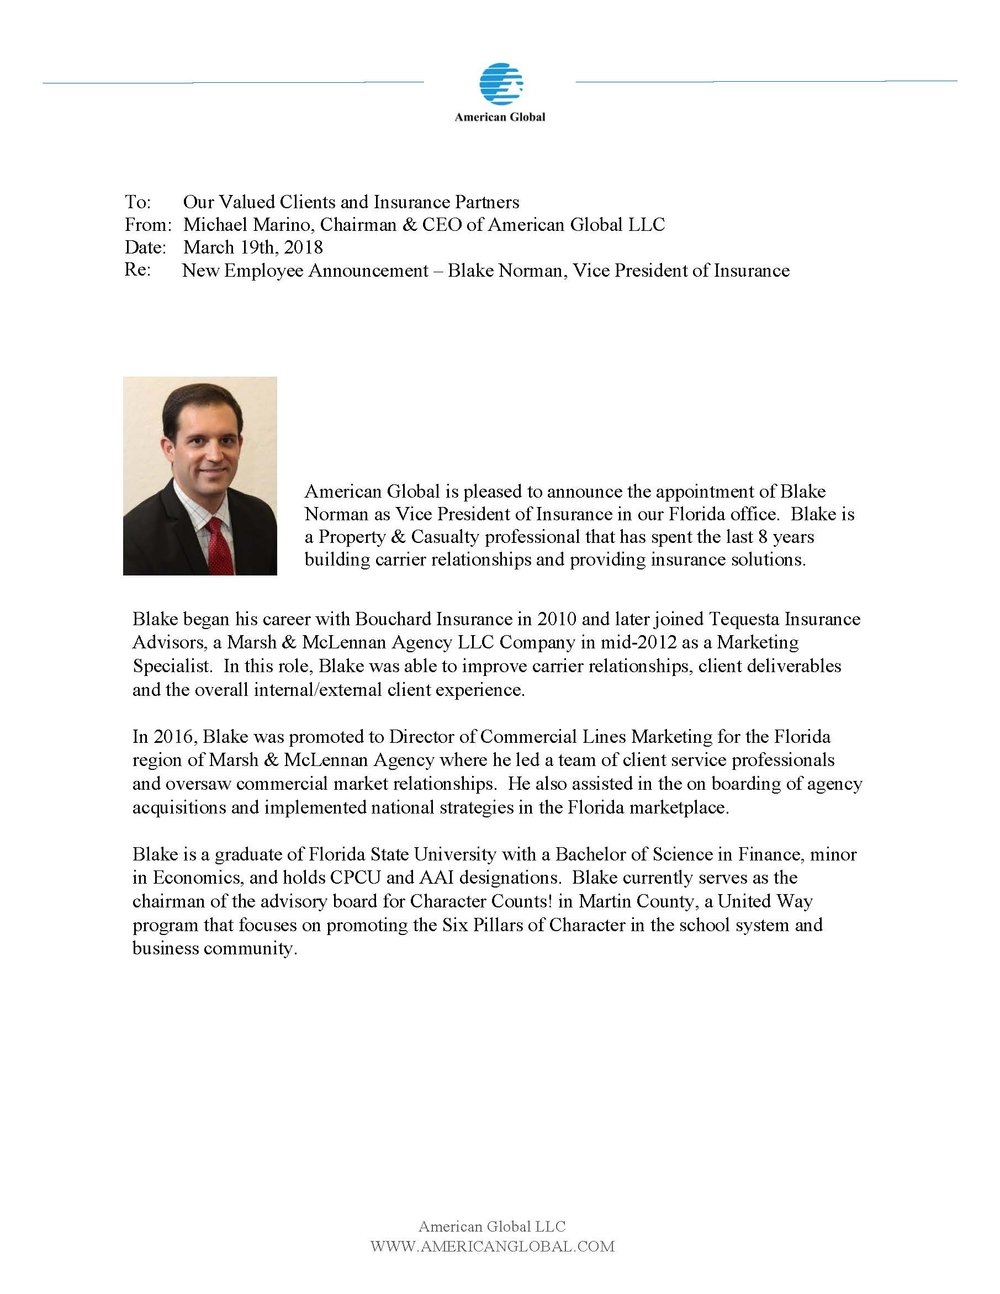 American Global New Employee Announcement -Blake Norman.jpg